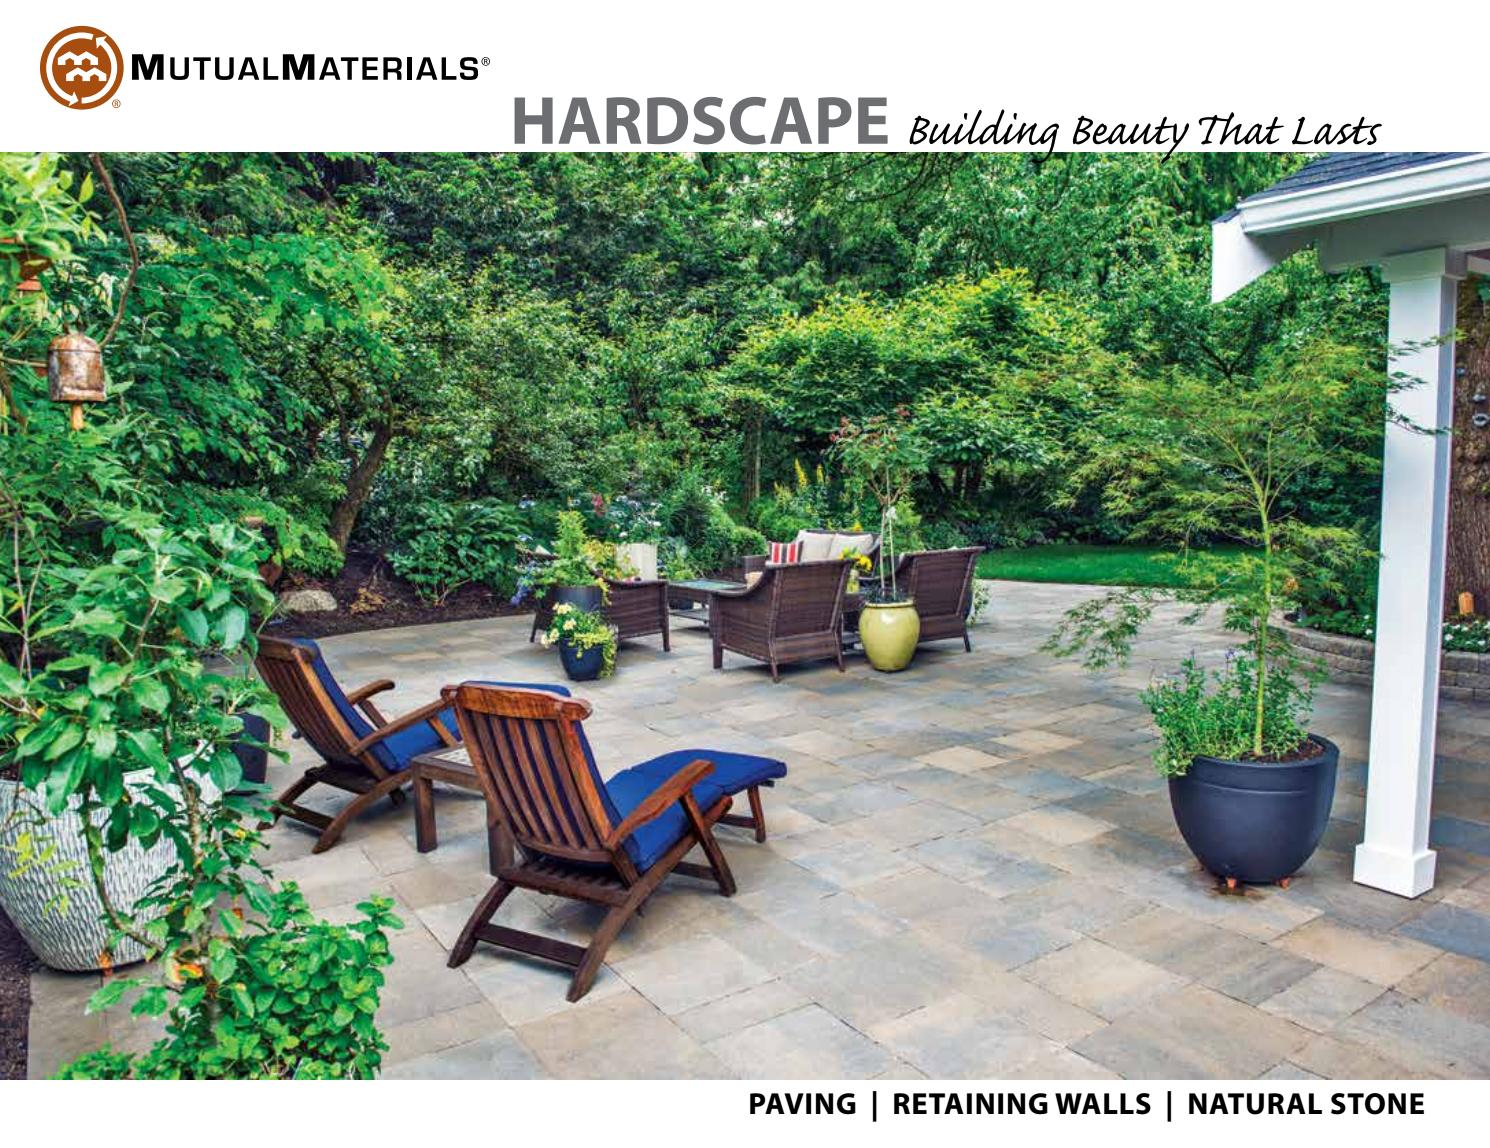 Paver Masonry 28 Oz Aesthetic Appearance Srw Adhesive Highest Performing Product Retaining Wall